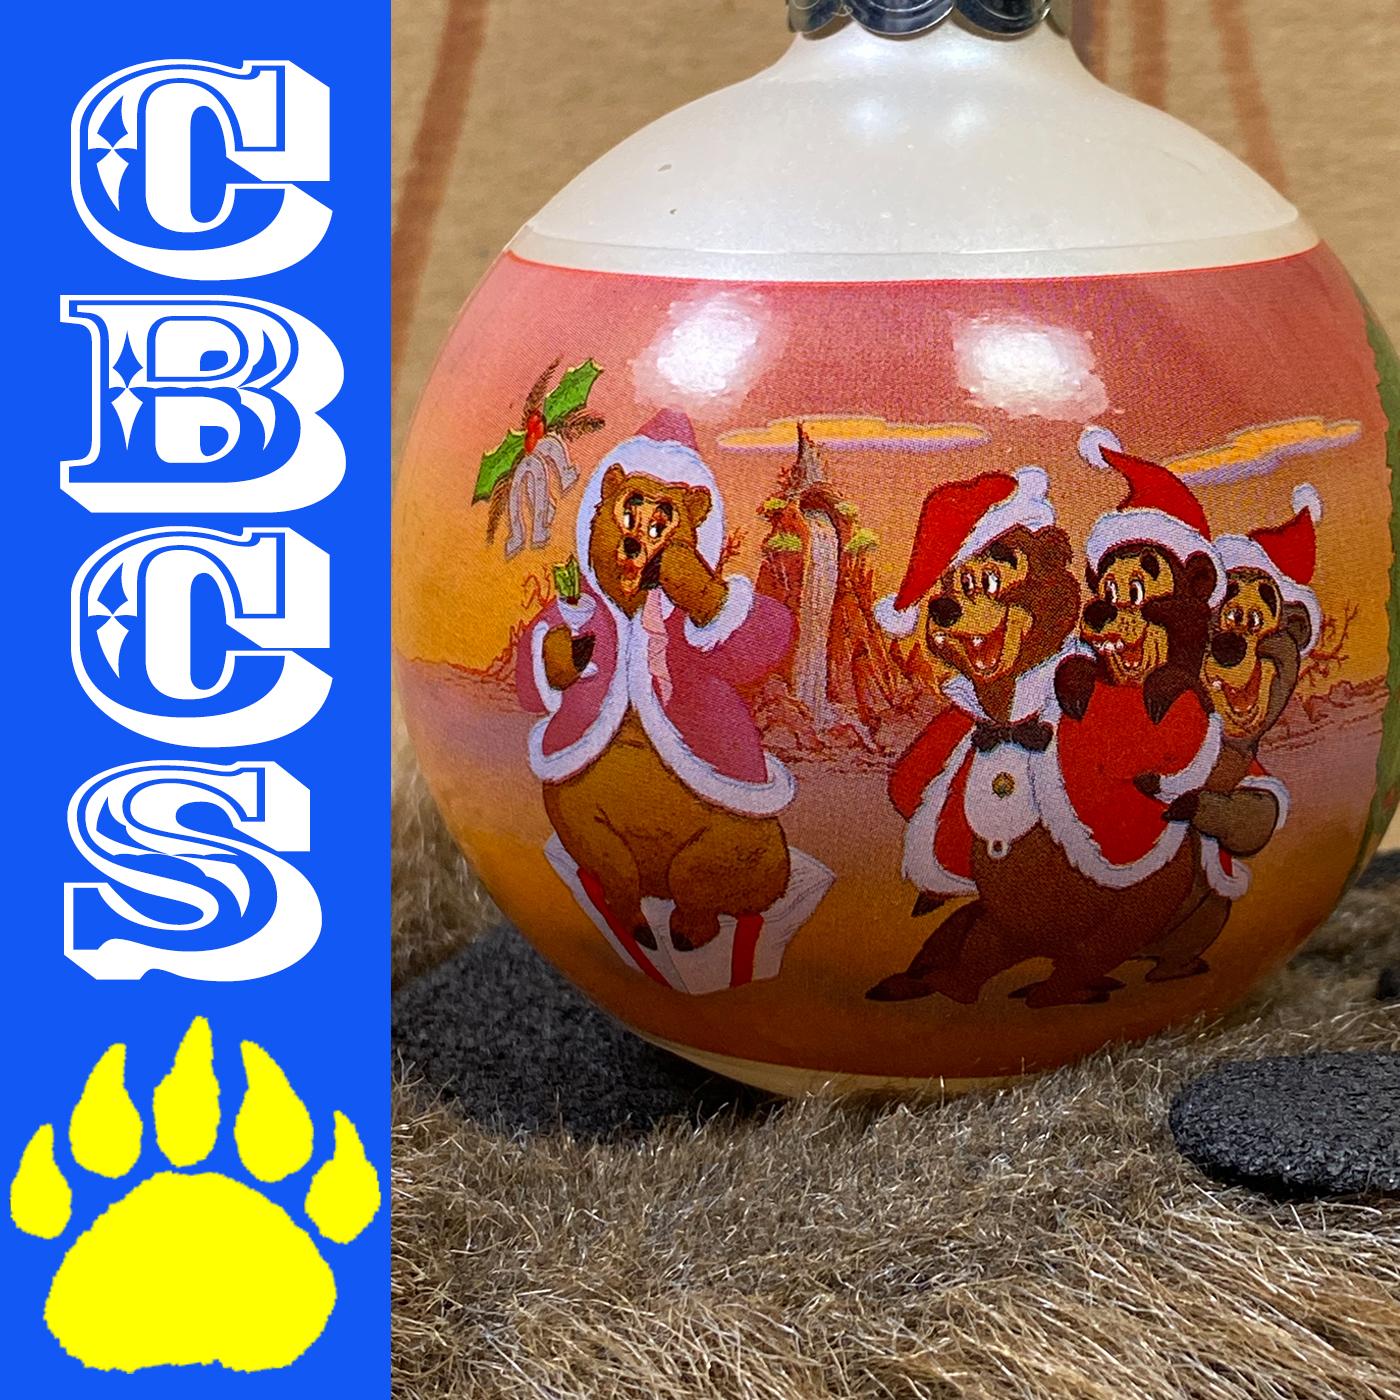 Artwork for 1996 Walt Disney World Frontierland Christmas Ornament - CBCS #232